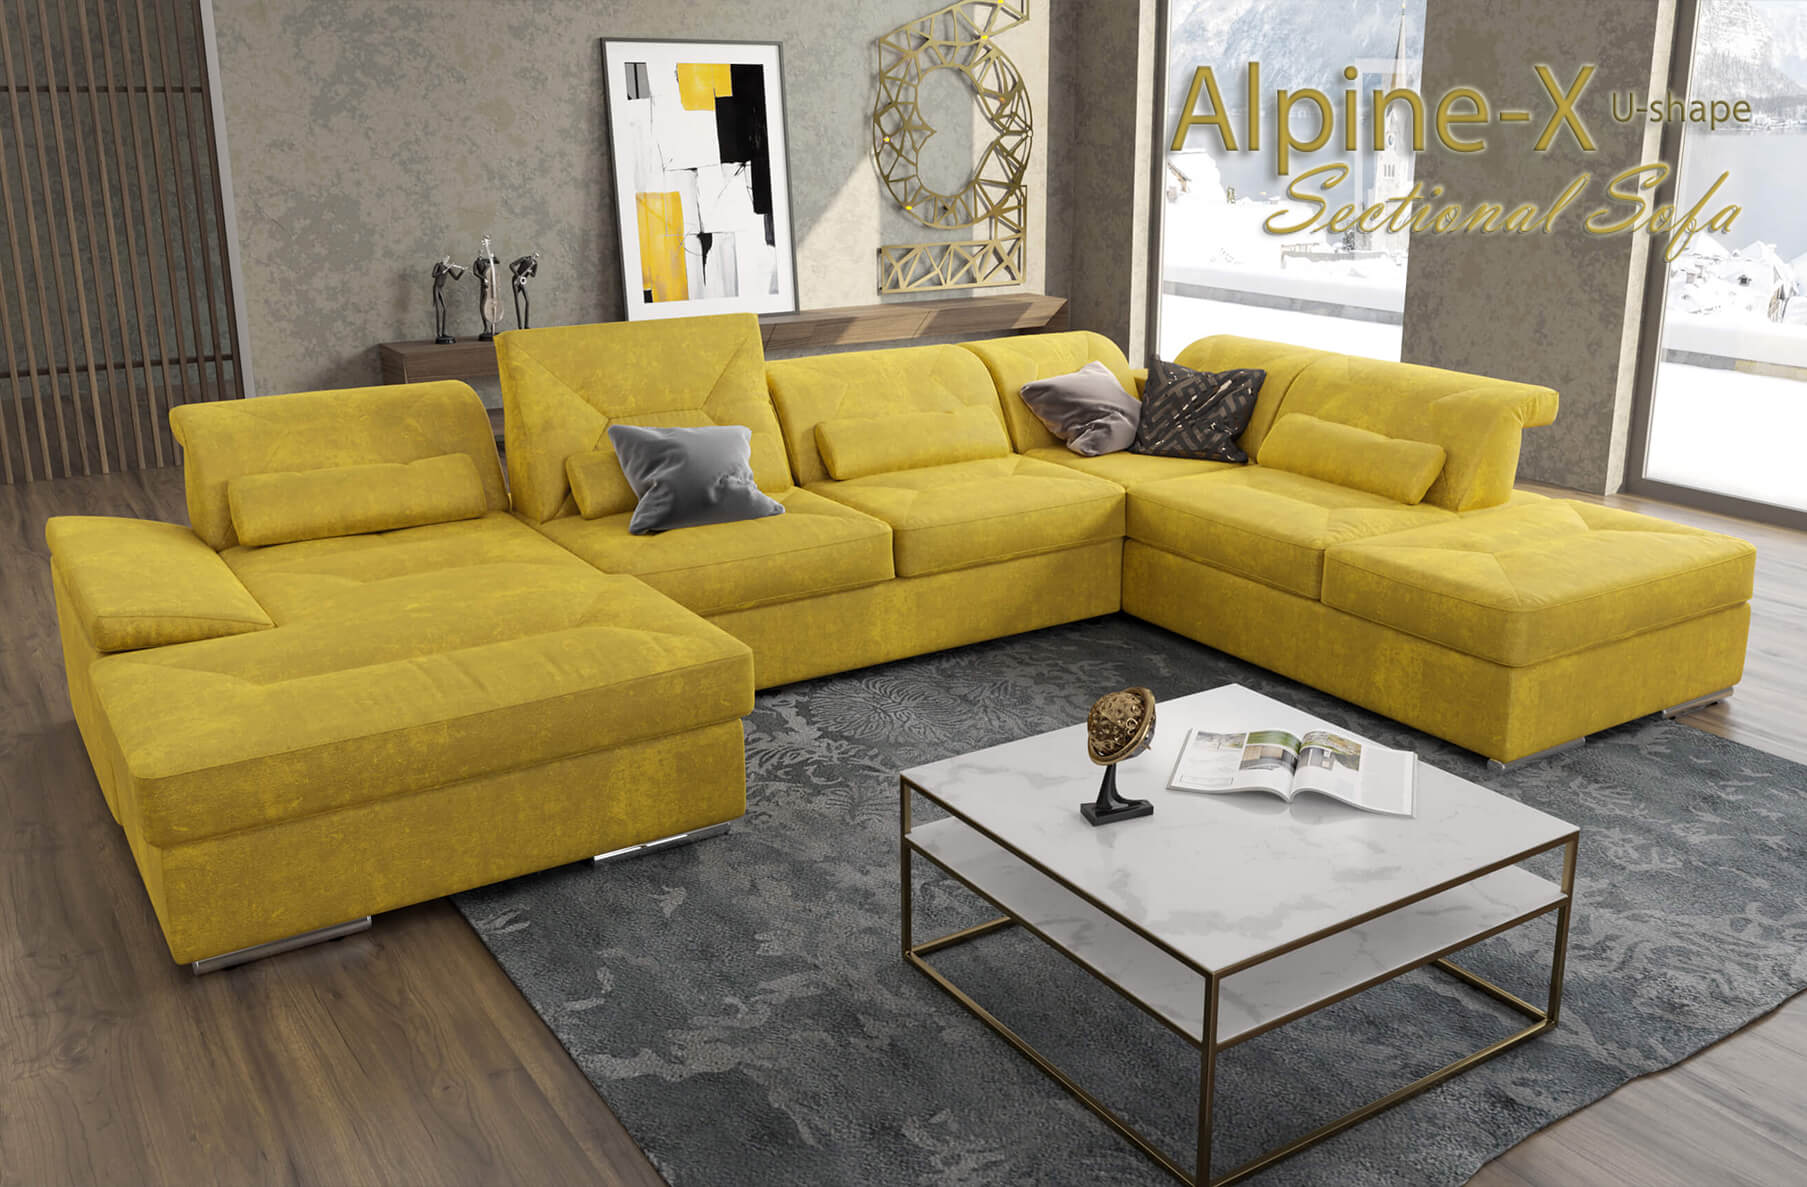 Alpine-X Sectional Sofa U-shape   Nordholtz